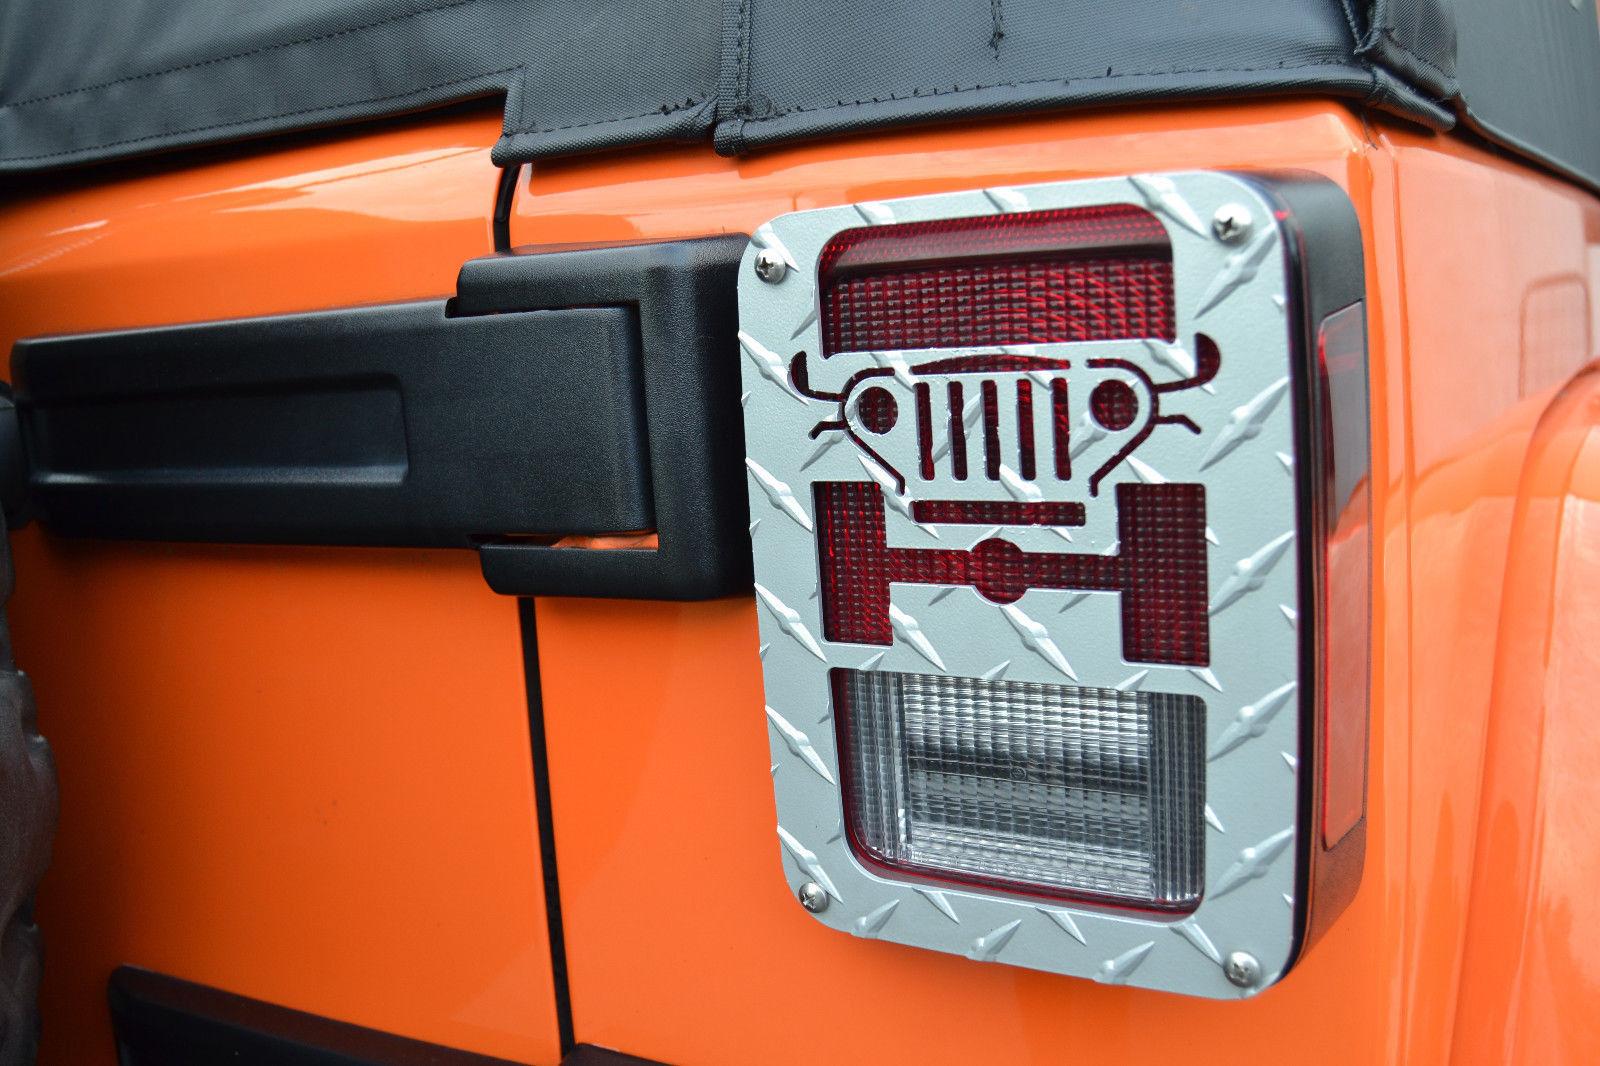 US ライトガード プロテクター ジープツイークシルバーテールライトガードジープラングラーJK 2007-2015- JT01S Jeep Tweaks Silver Tail Light Guards Jeep Wrangler JK 2007-2015- JT01S